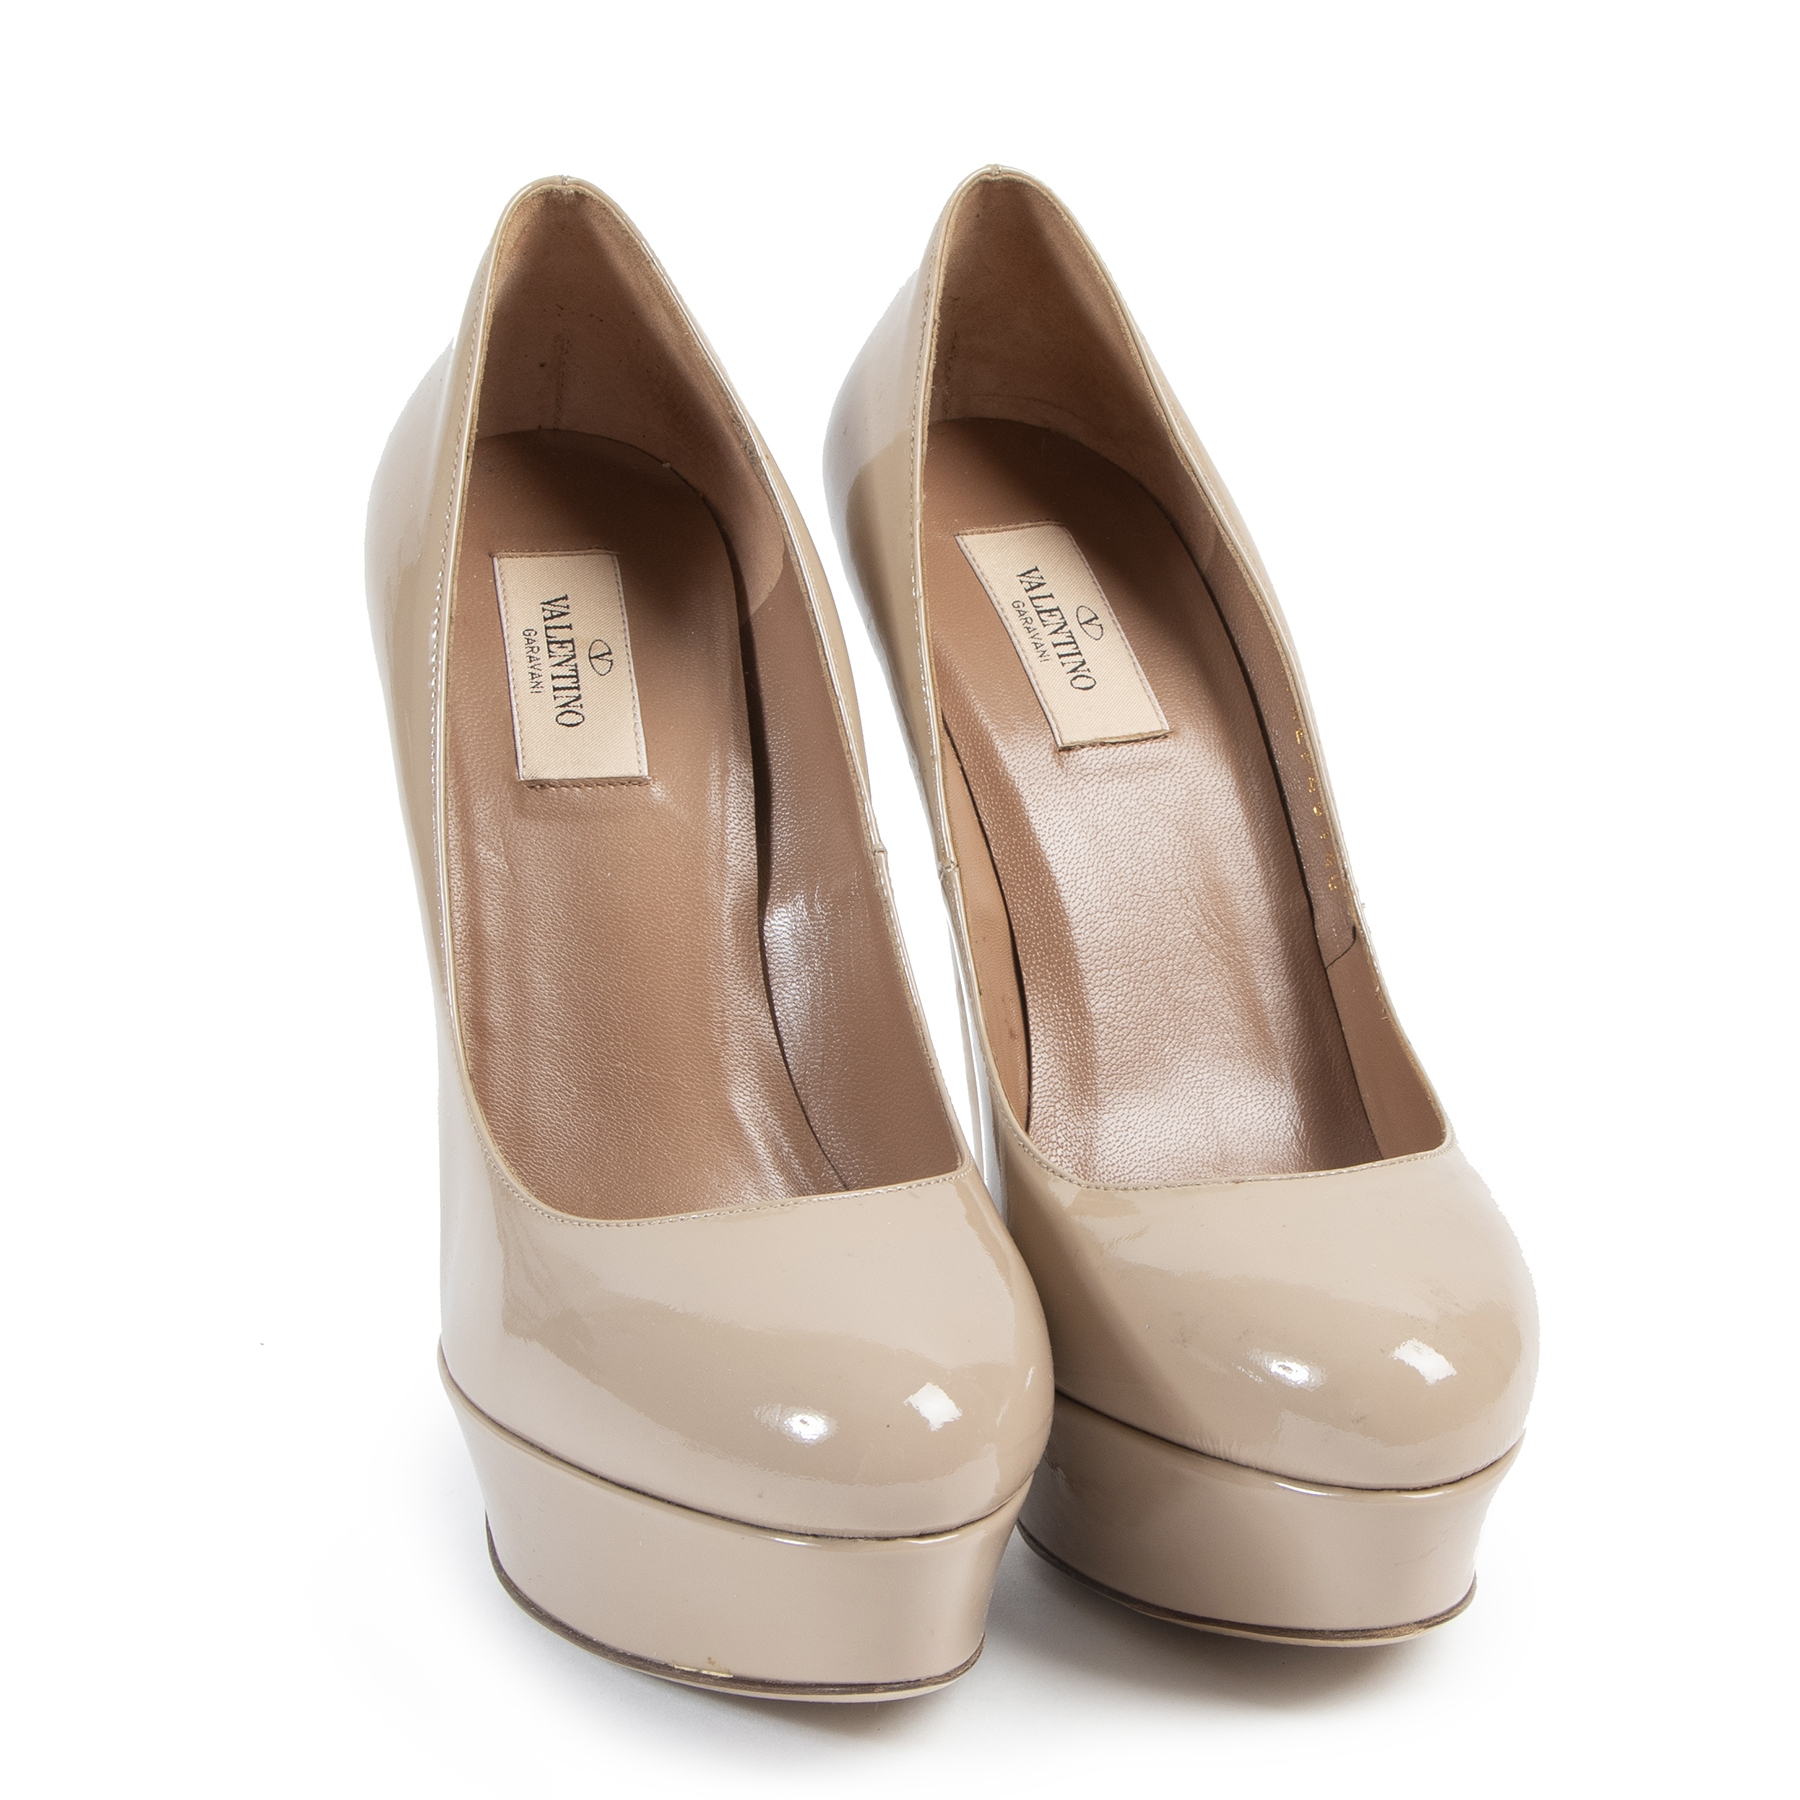 Authentic secondhand Valentino Nude Patent Leather Classic Platform Pumps - Size 40 designer shoes fashion luxury vintage webshop safe secure online shopping